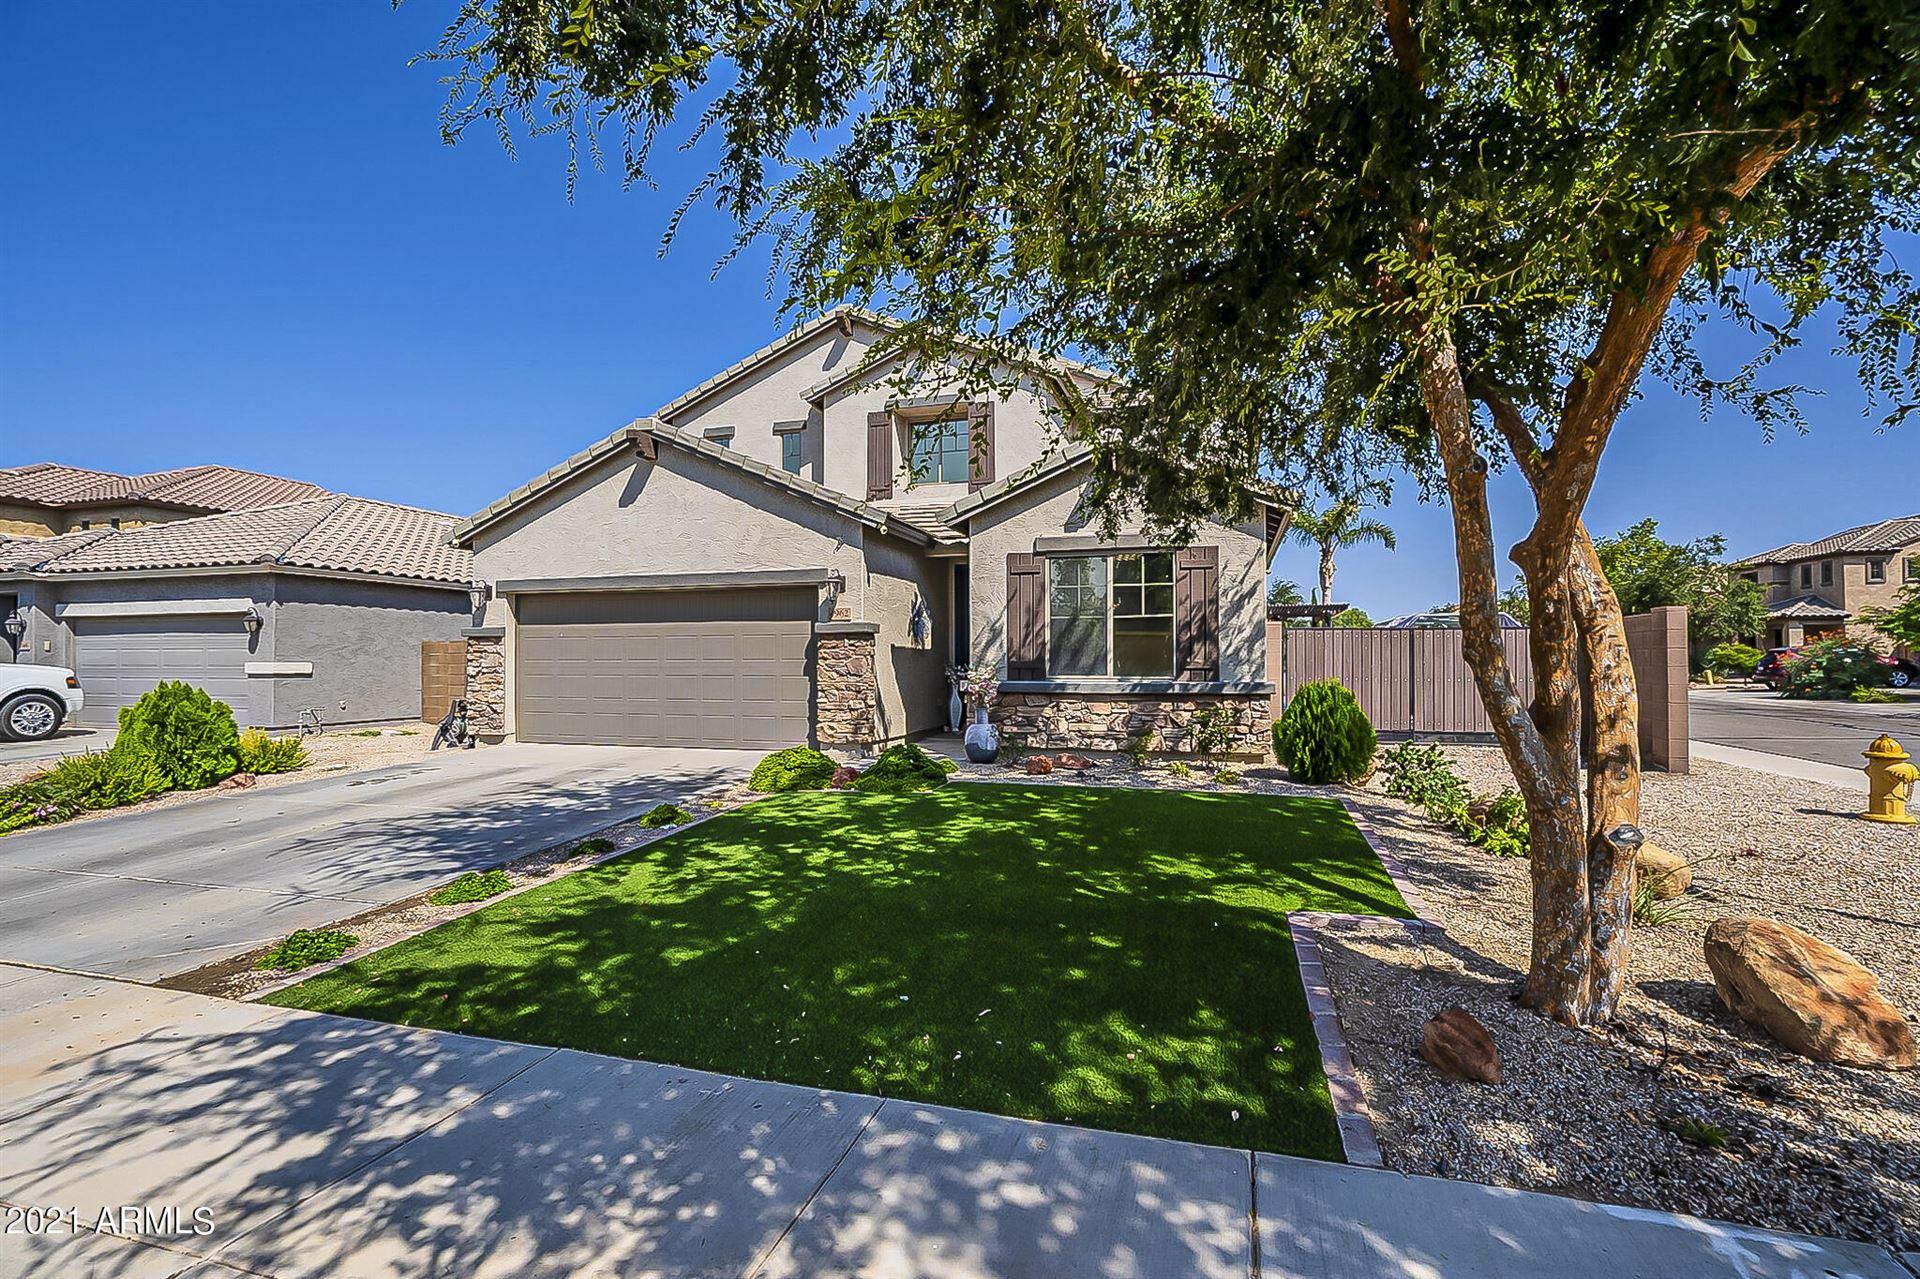 Photo of 4962 E DEL RIO Drive, San Tan Valley, AZ 85140 (MLS # 6293535)